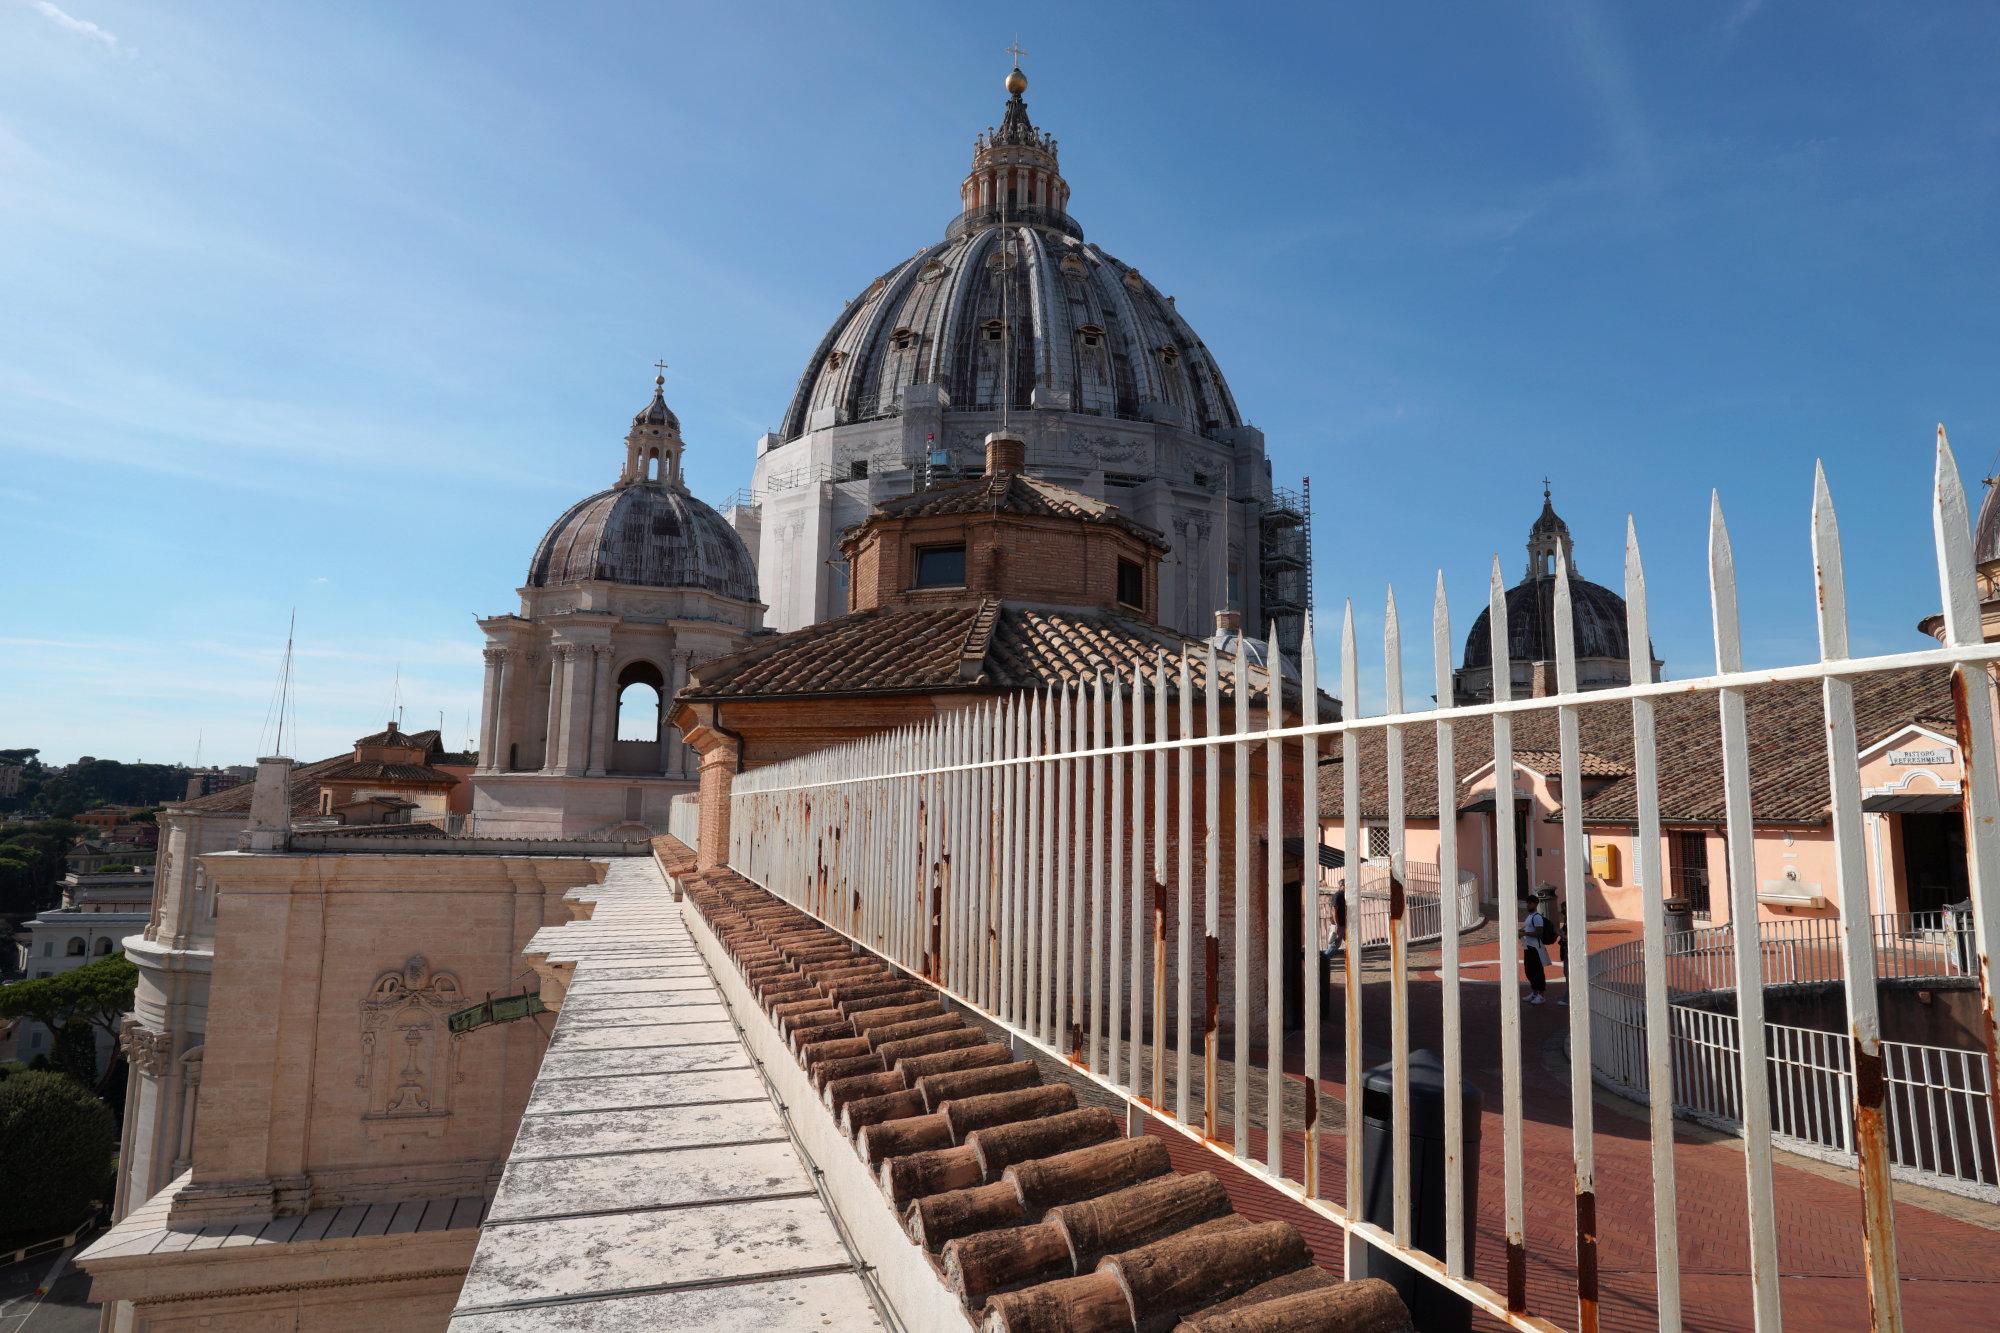 Vatikan Petersdom Kuppel